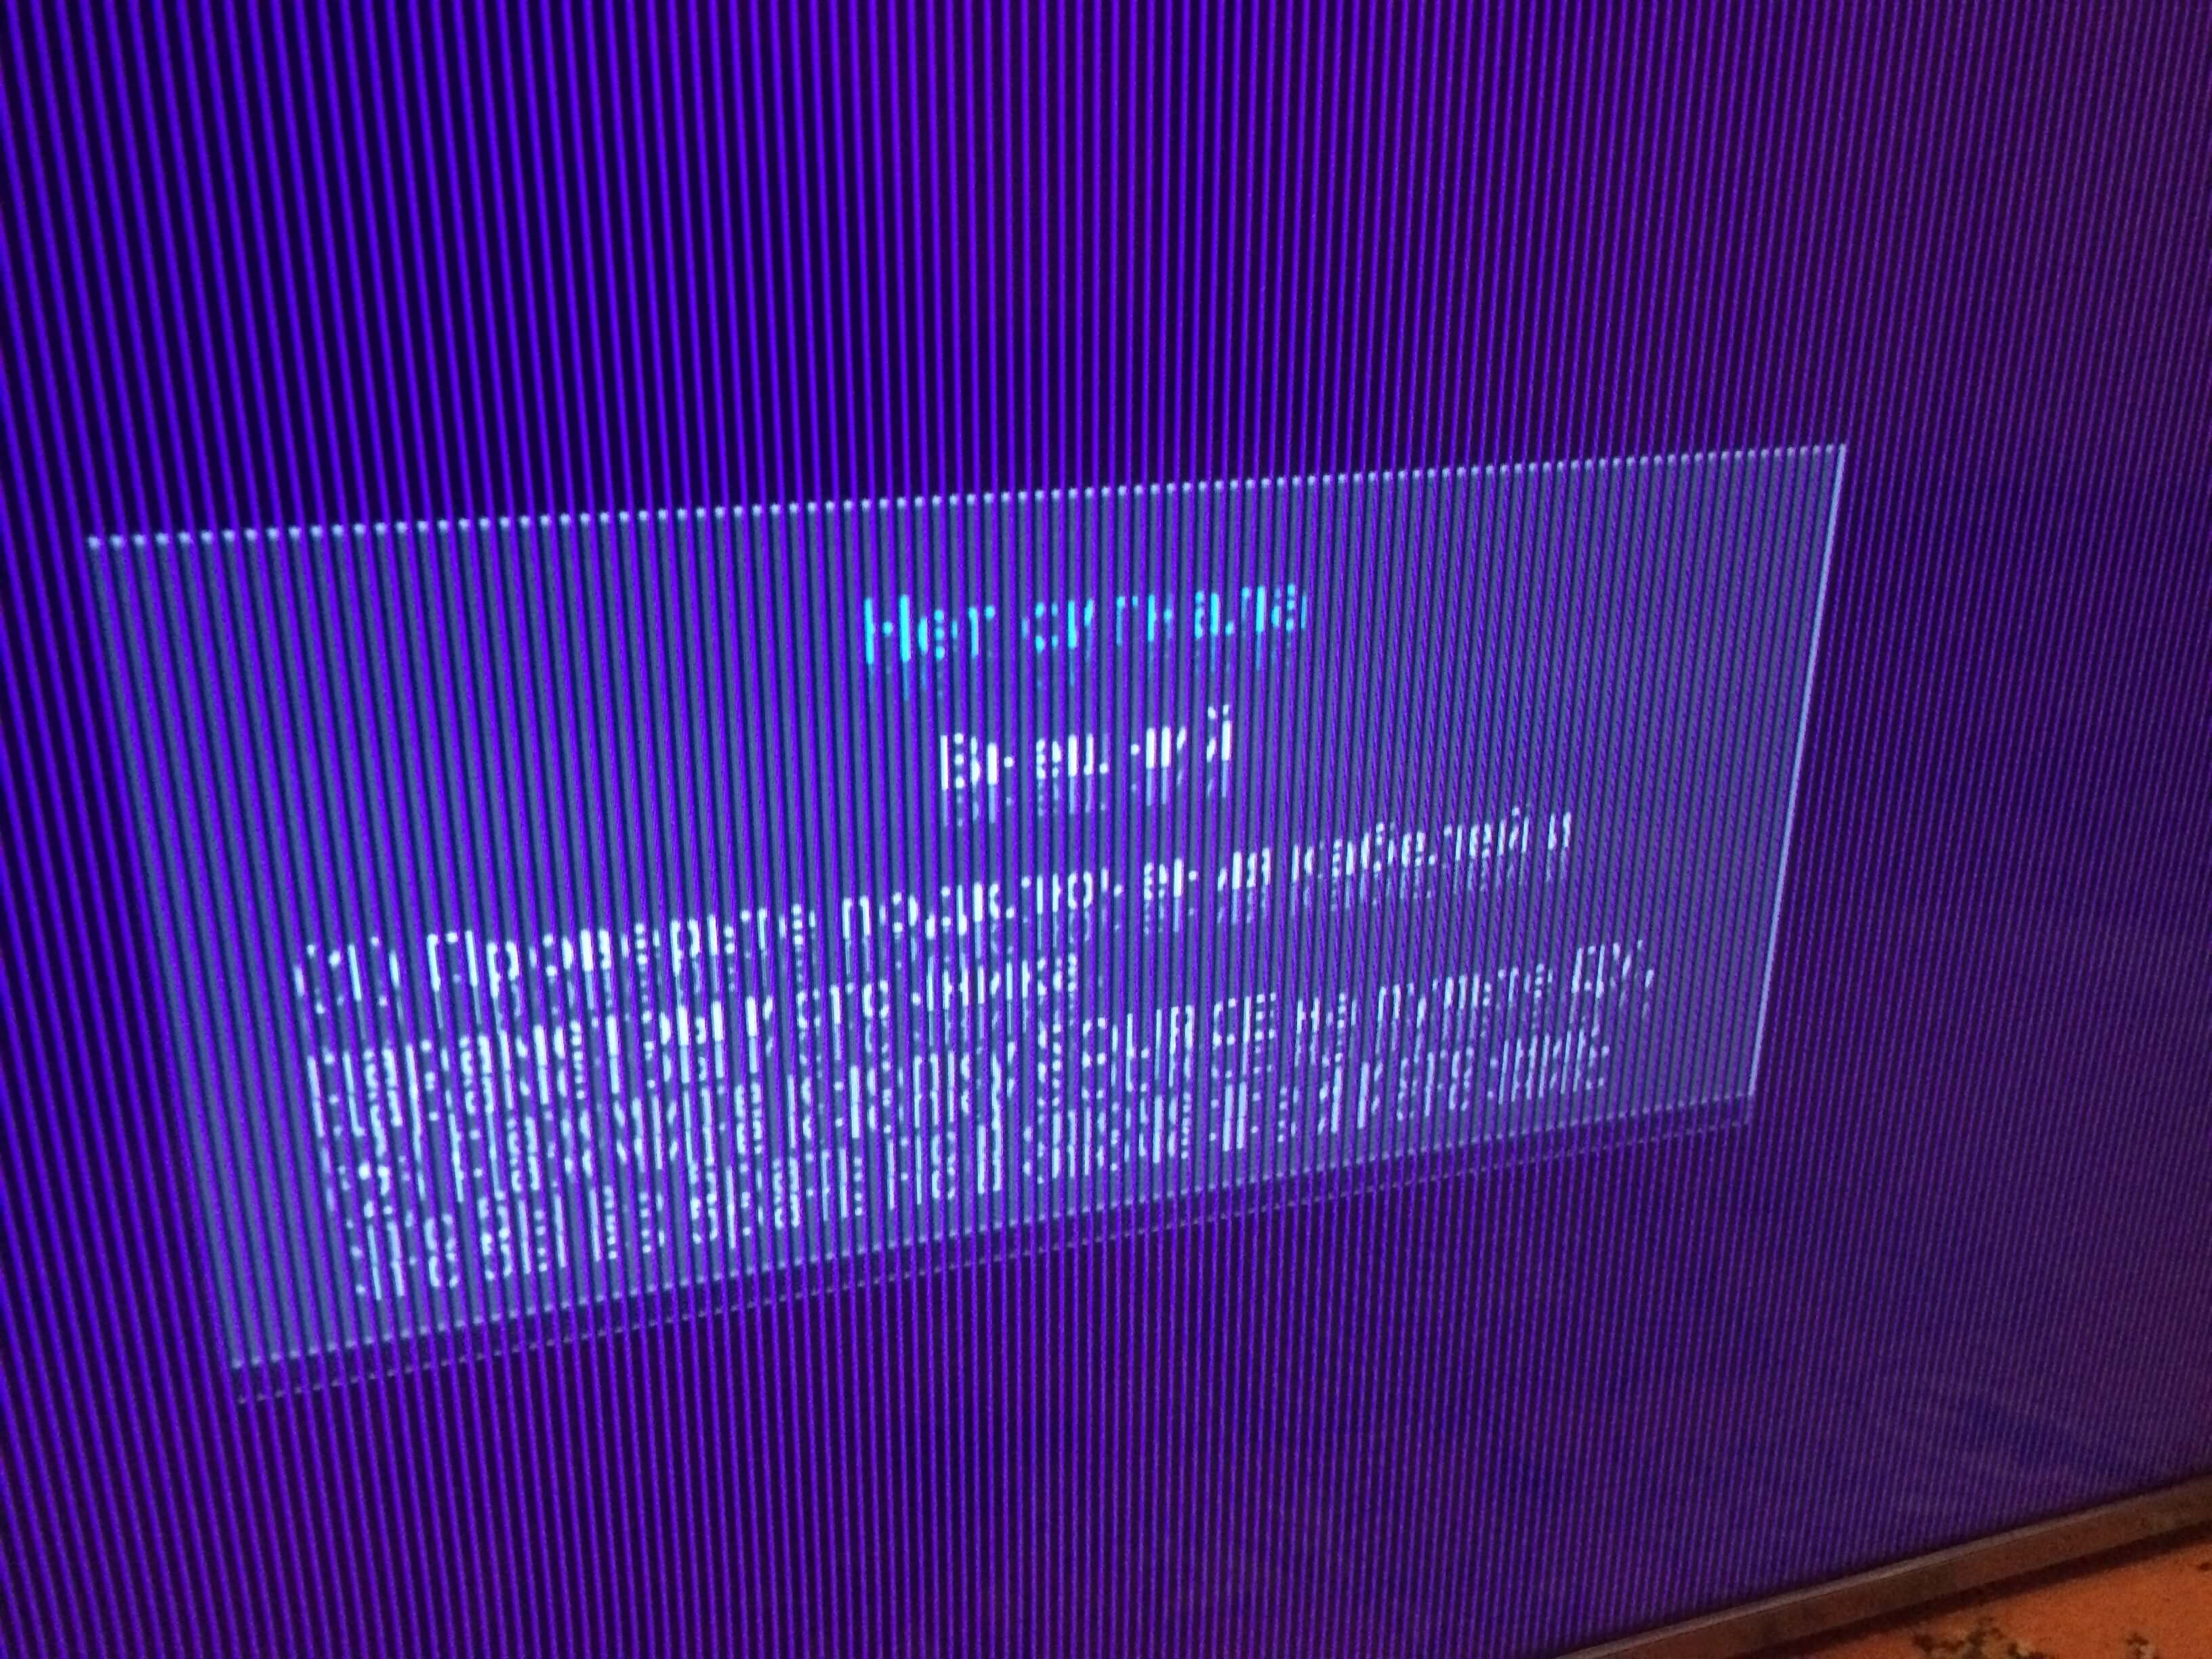 схема бп samsung le19r86bd